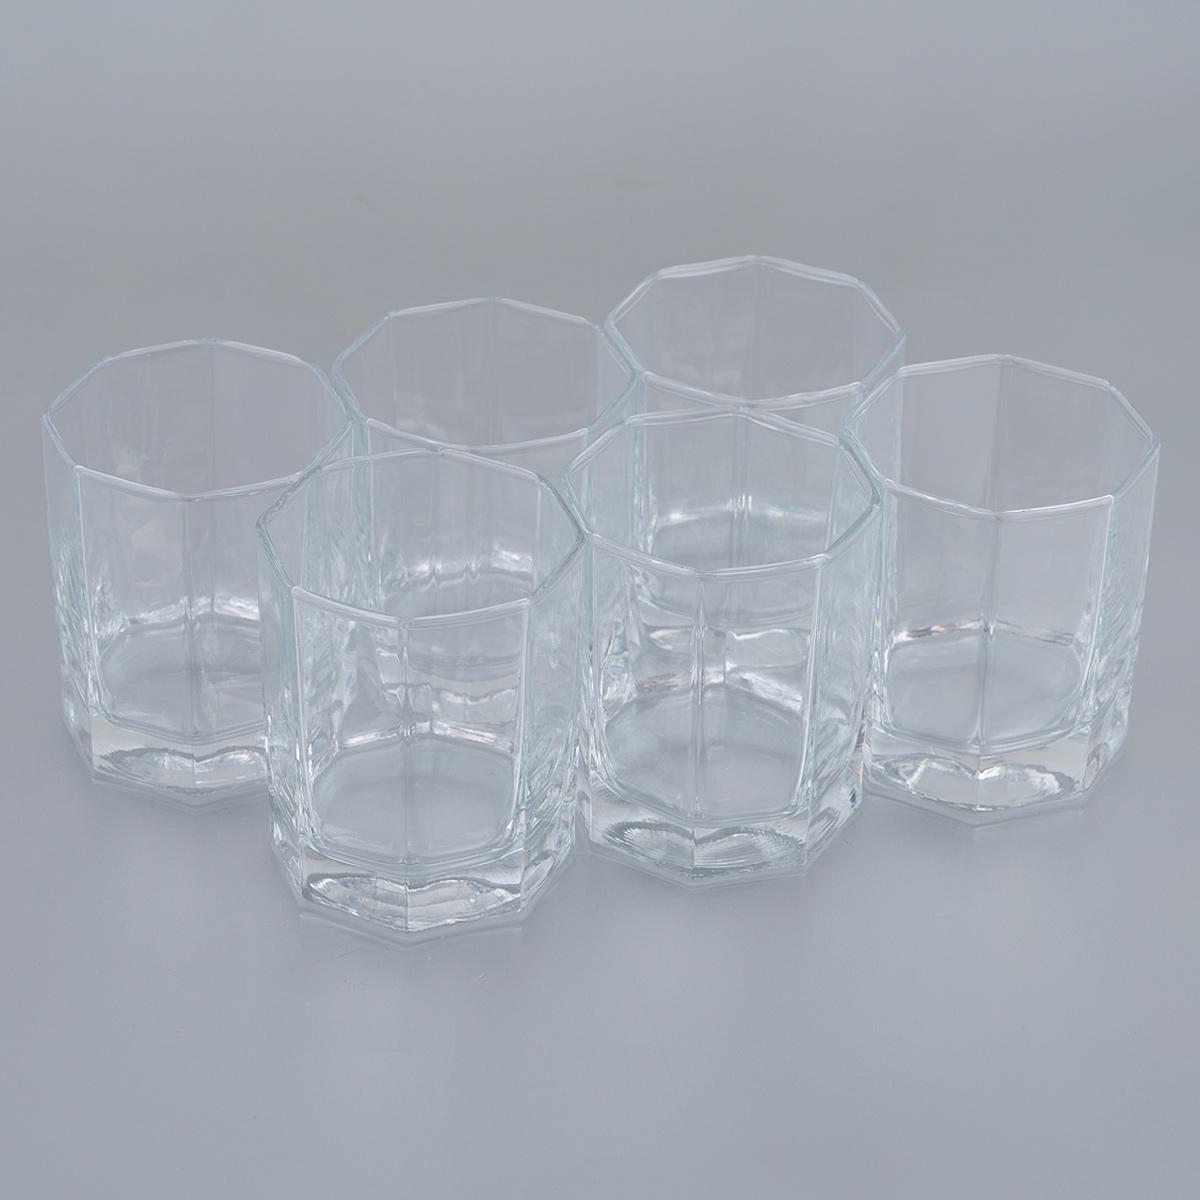 Набор стаканов для сока Pasabahce Kosem, 210 мл, 6 шт набор стаканов для сока pasabahce tango 6 преметов